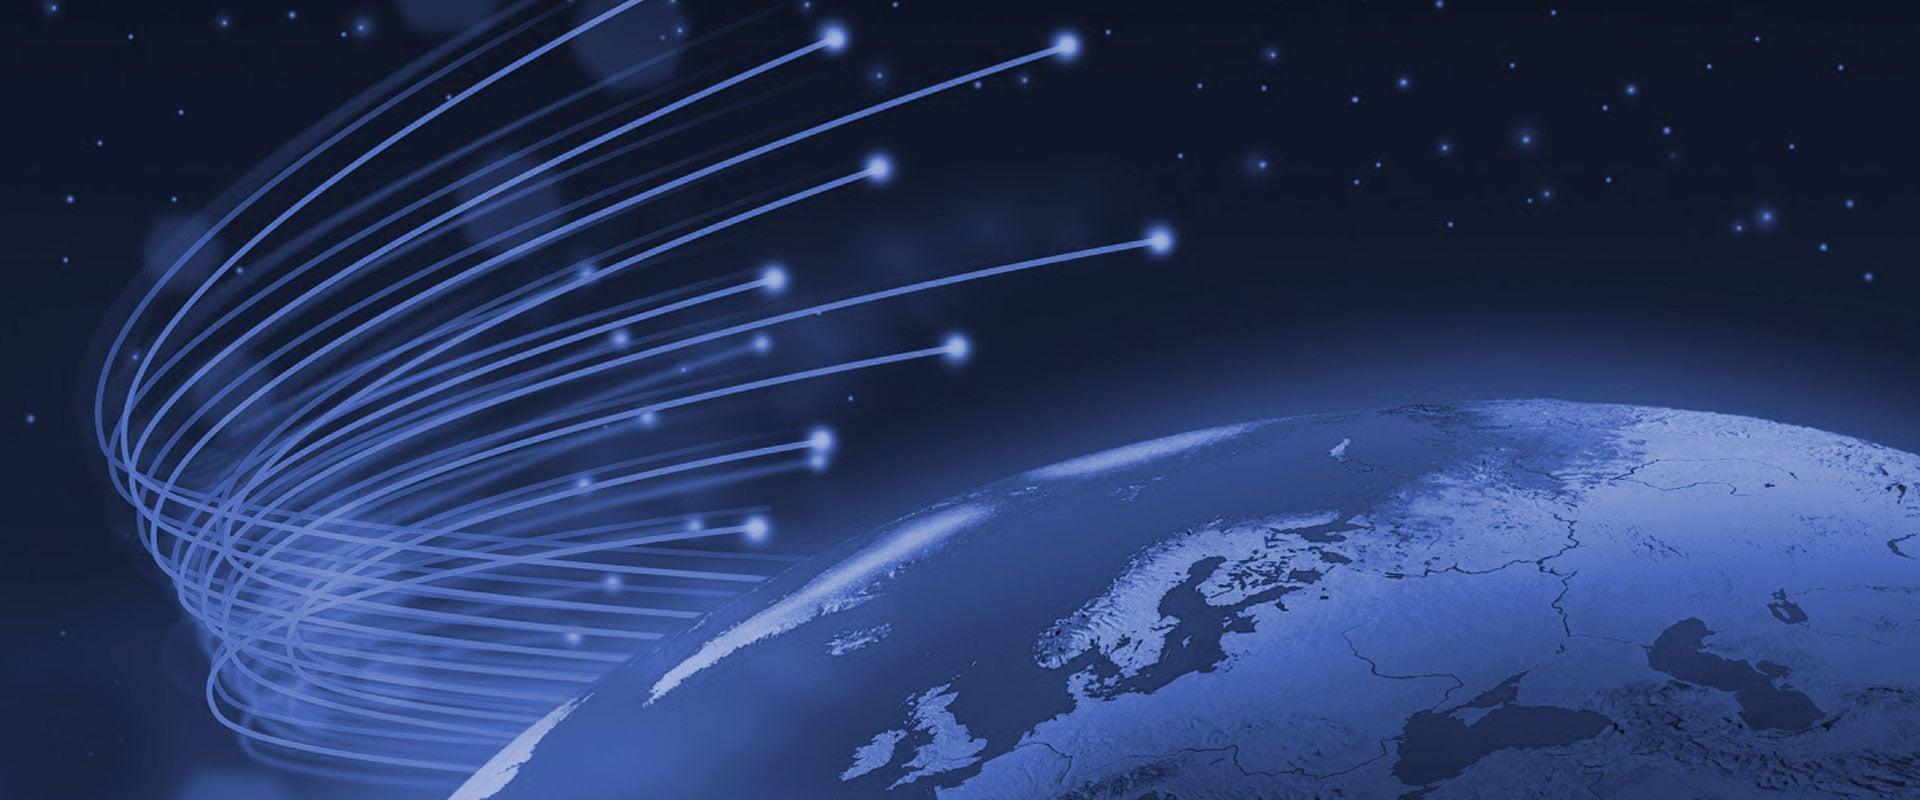 GPON - Configuración de redes FTTH